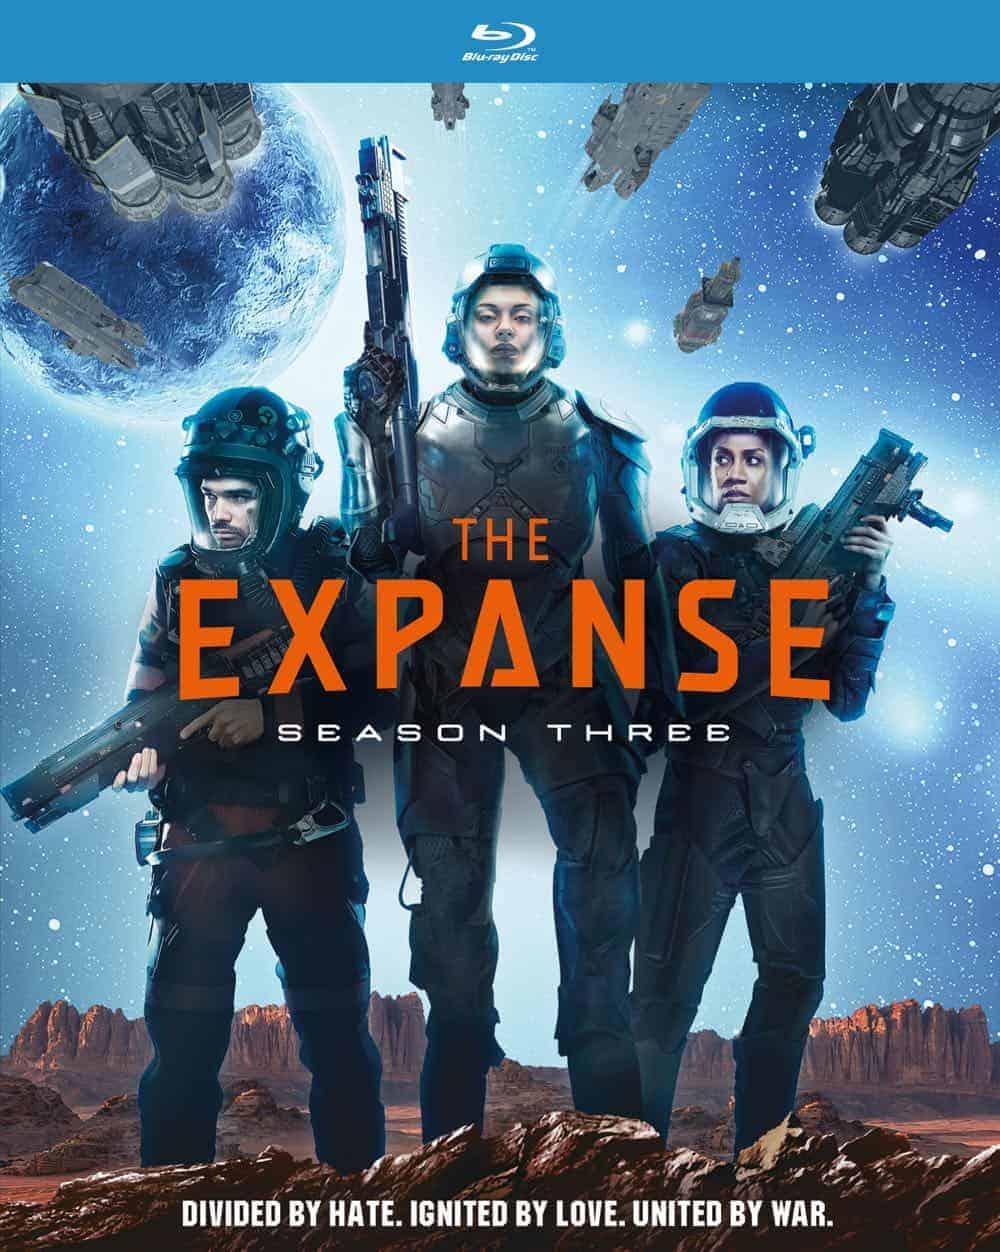 THE EXPANSE Season 3 Blu-ray